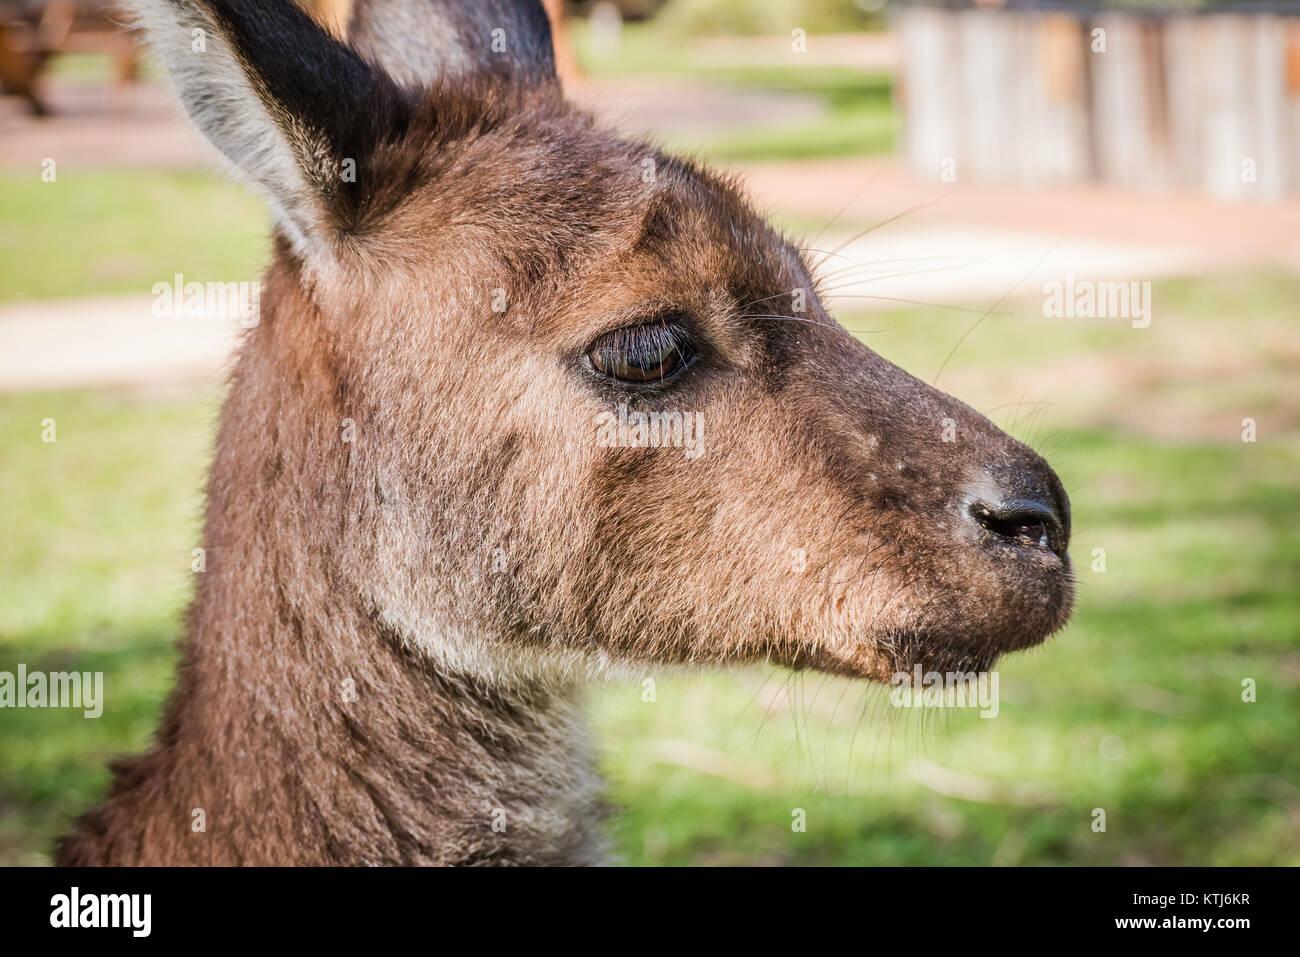 close up kangaroo head - Stock Image